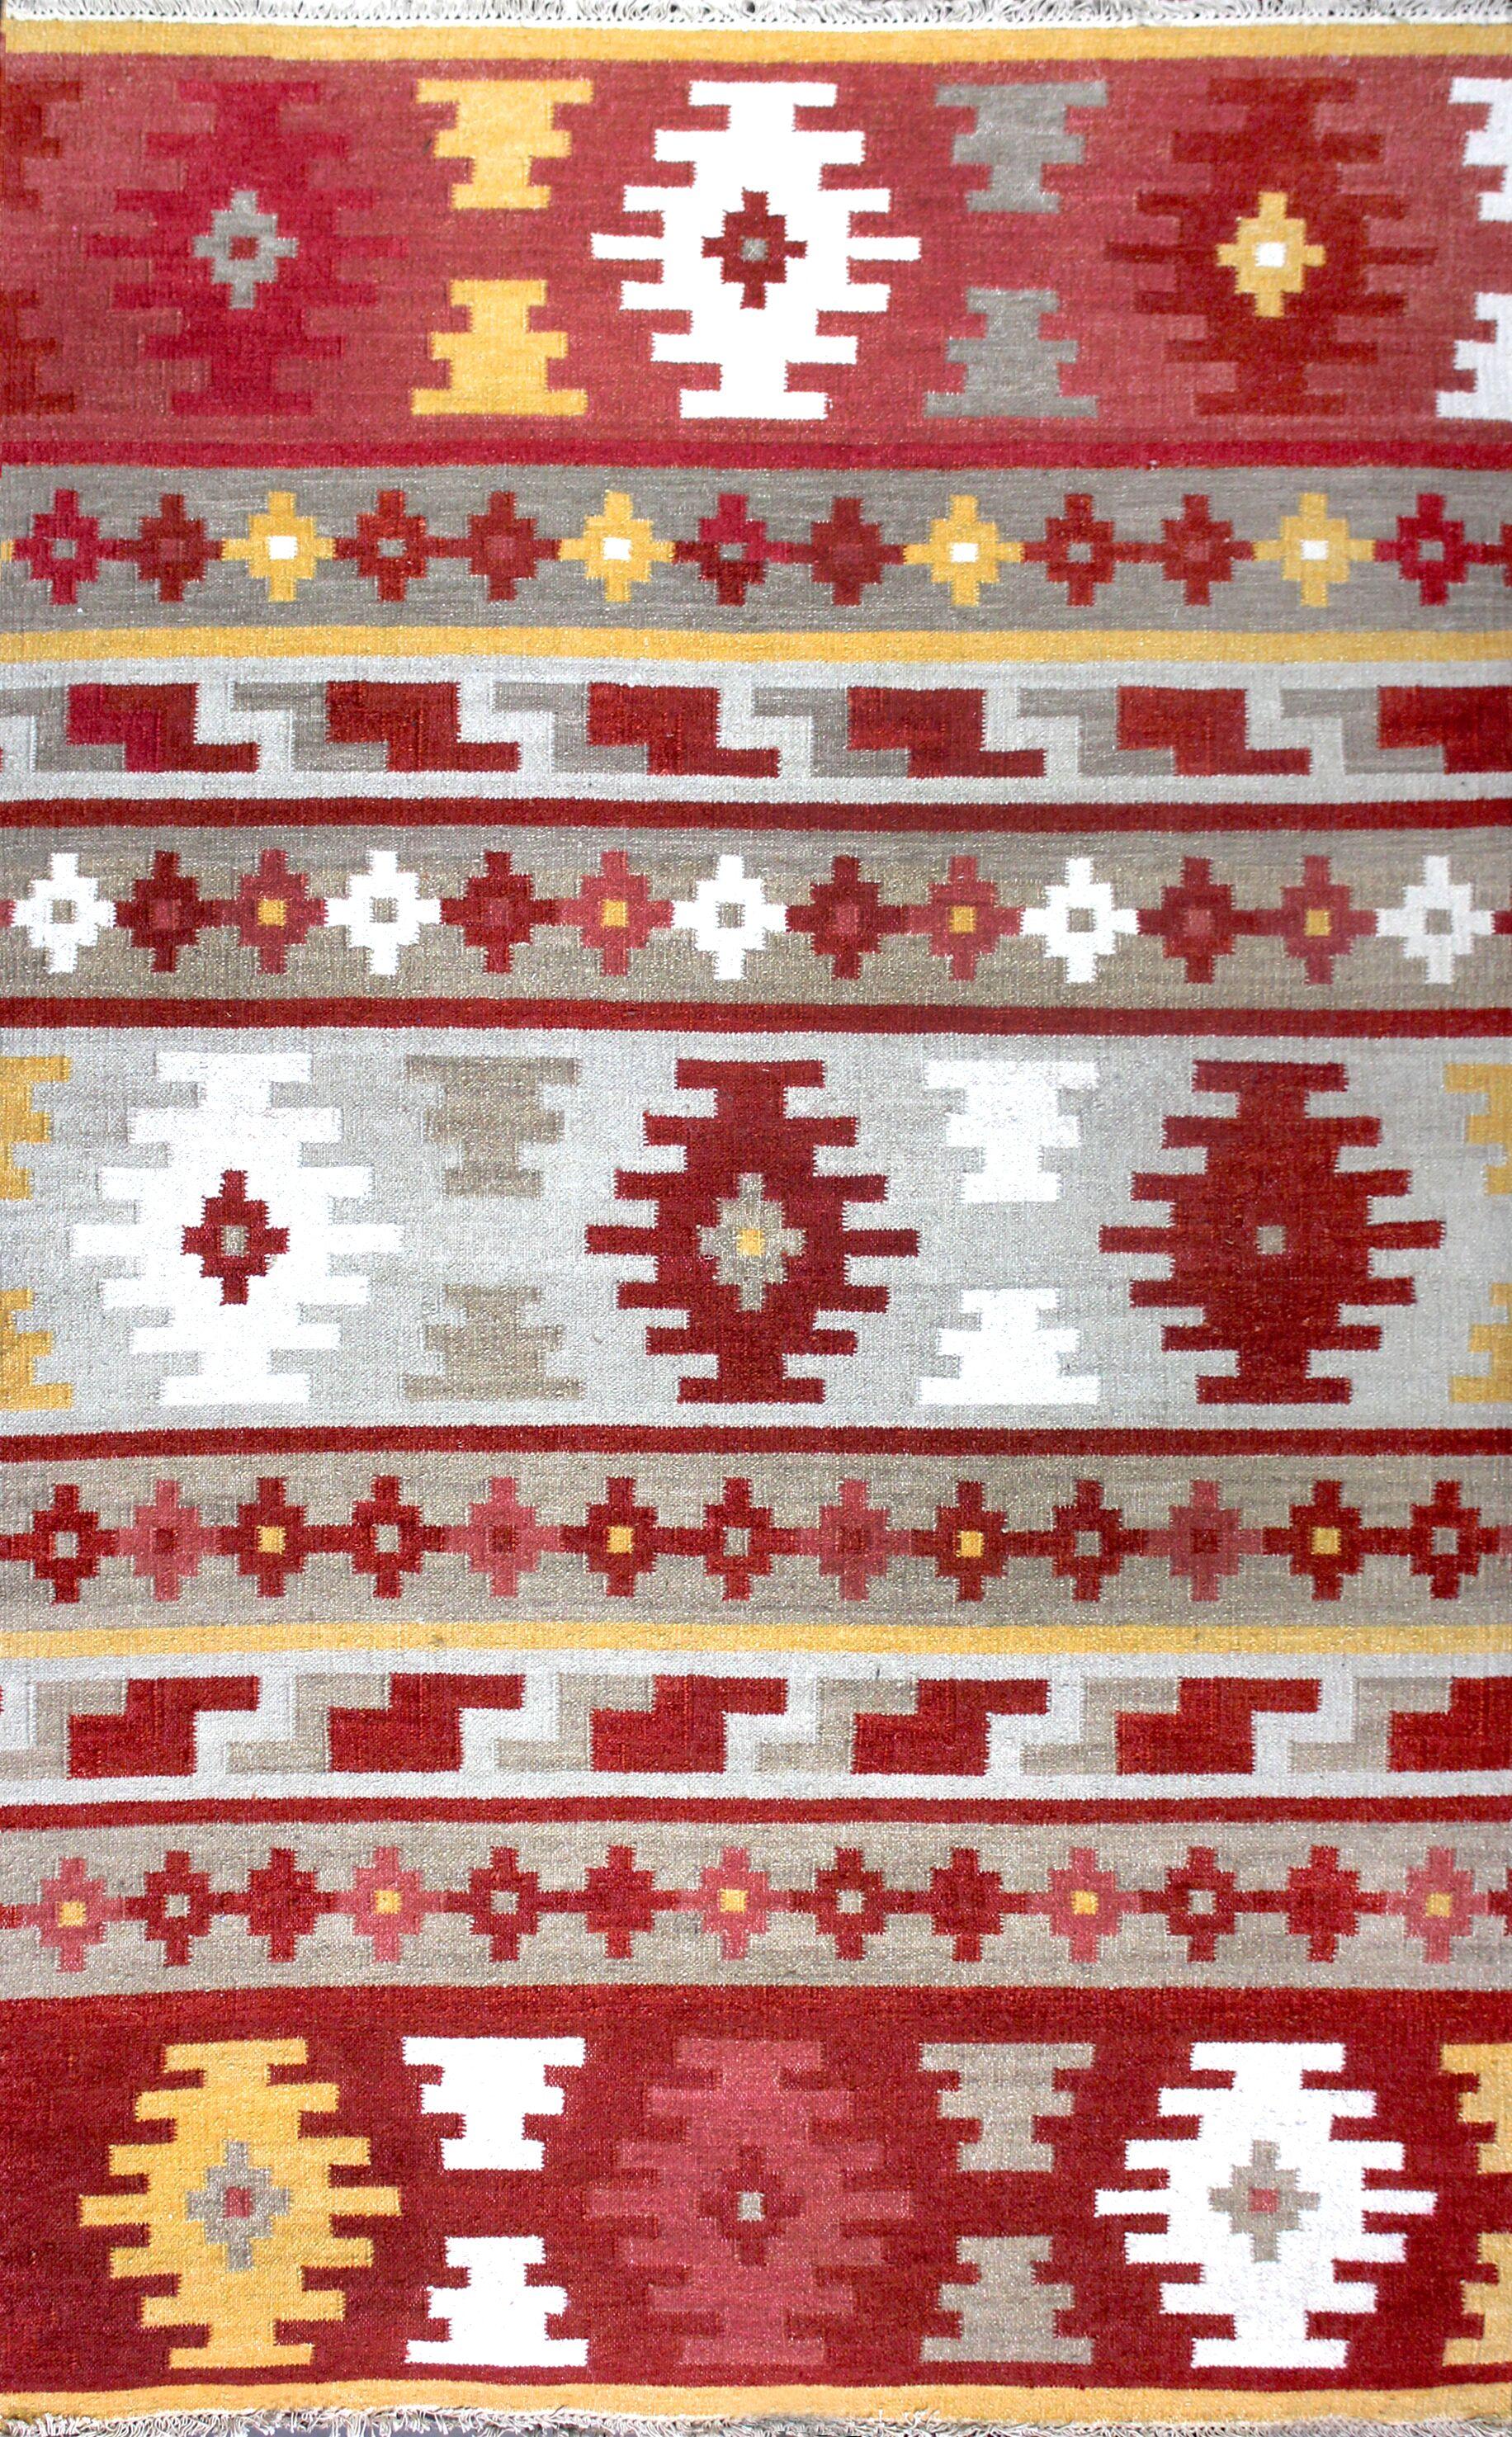 Patridge Hand Woven Wool Red/Orange Area Rug Rug Size: 8'6